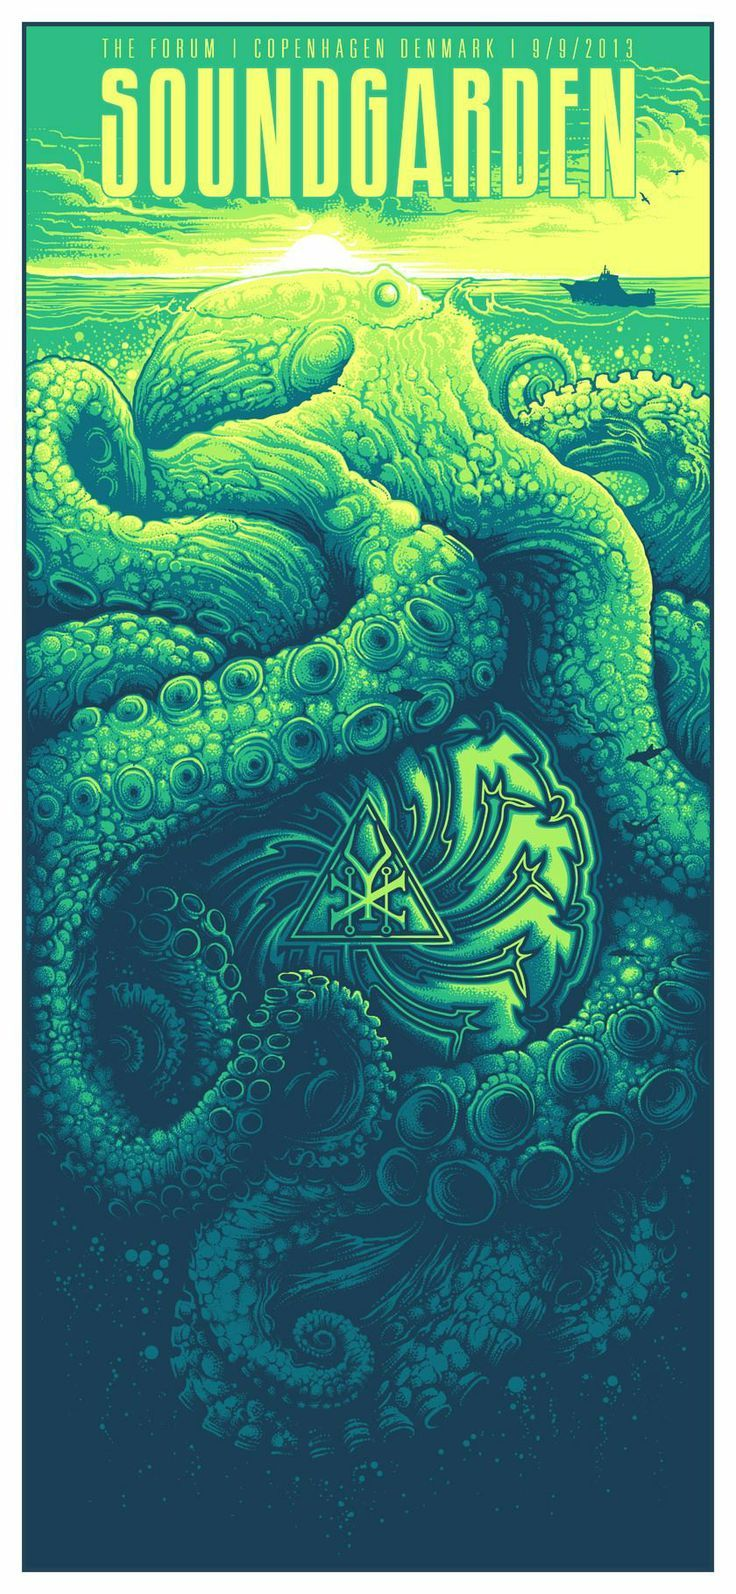 Soundgarden by Dan Mumford